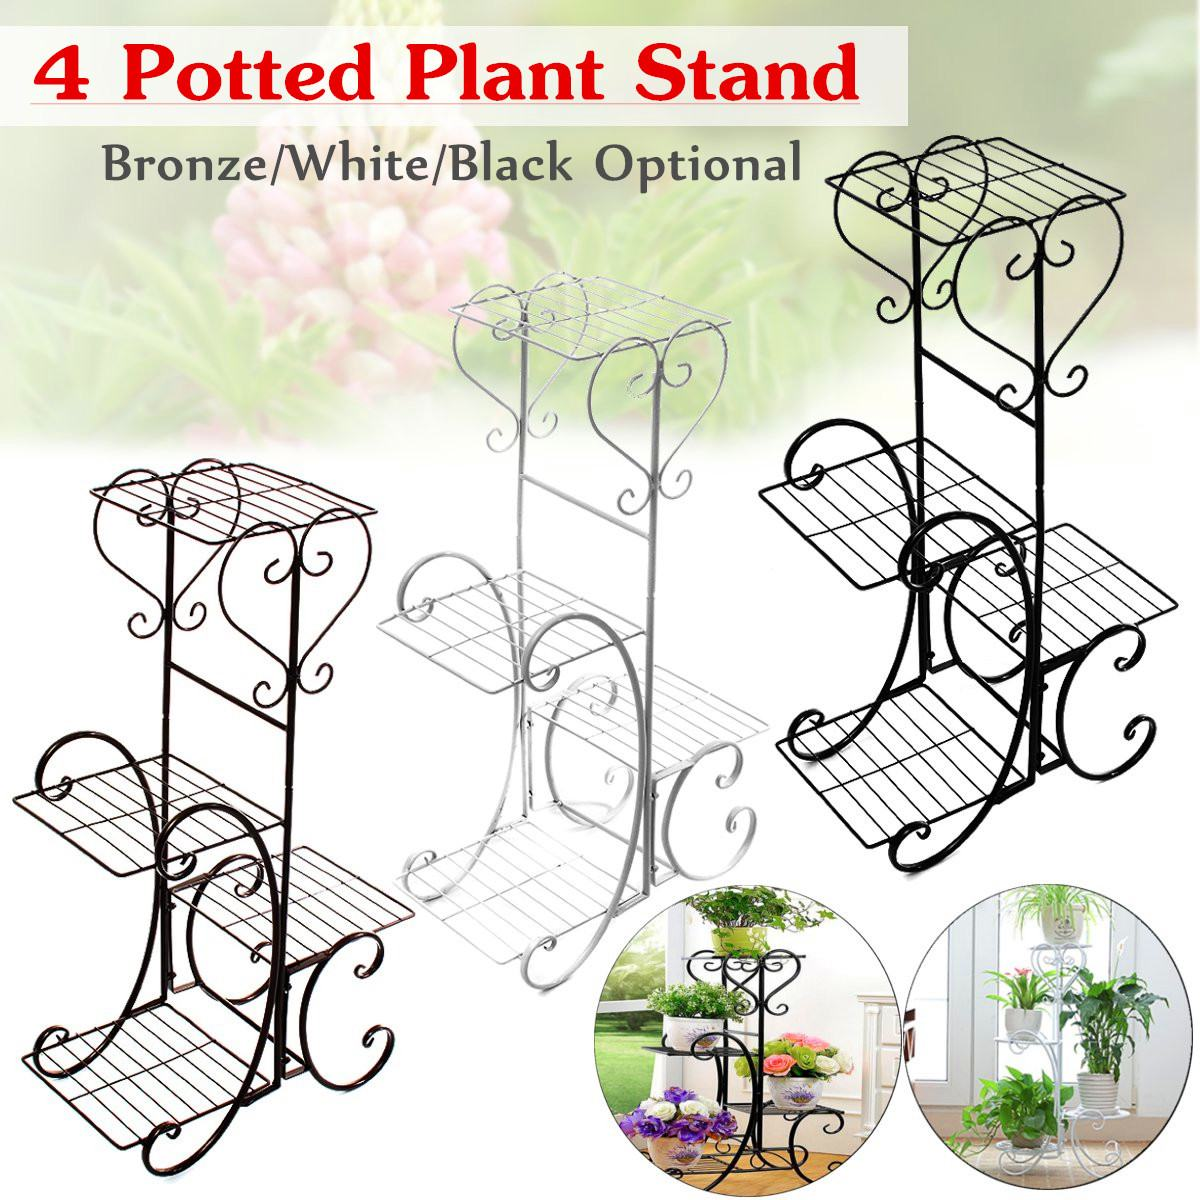 4-Tiers Iron Art Tree Design Plant Stand Holder Flower Pot Rack Garden Balcony Shelf Stand Outdoor Indoor Black White Bronze